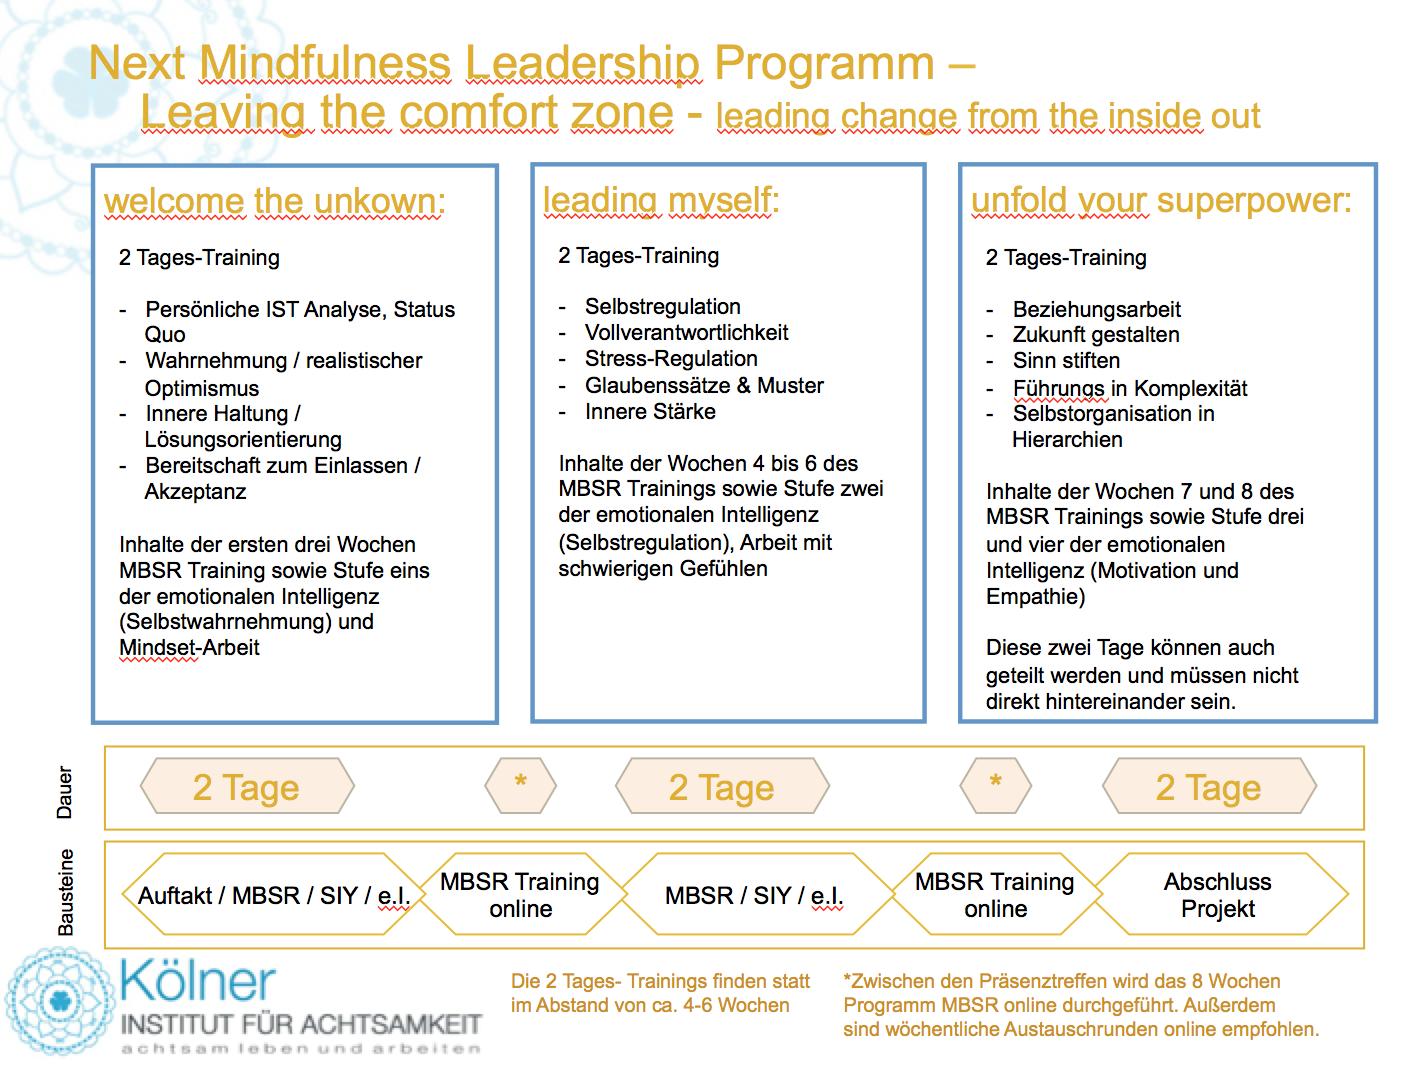 Next Mindfulness Leadership Program